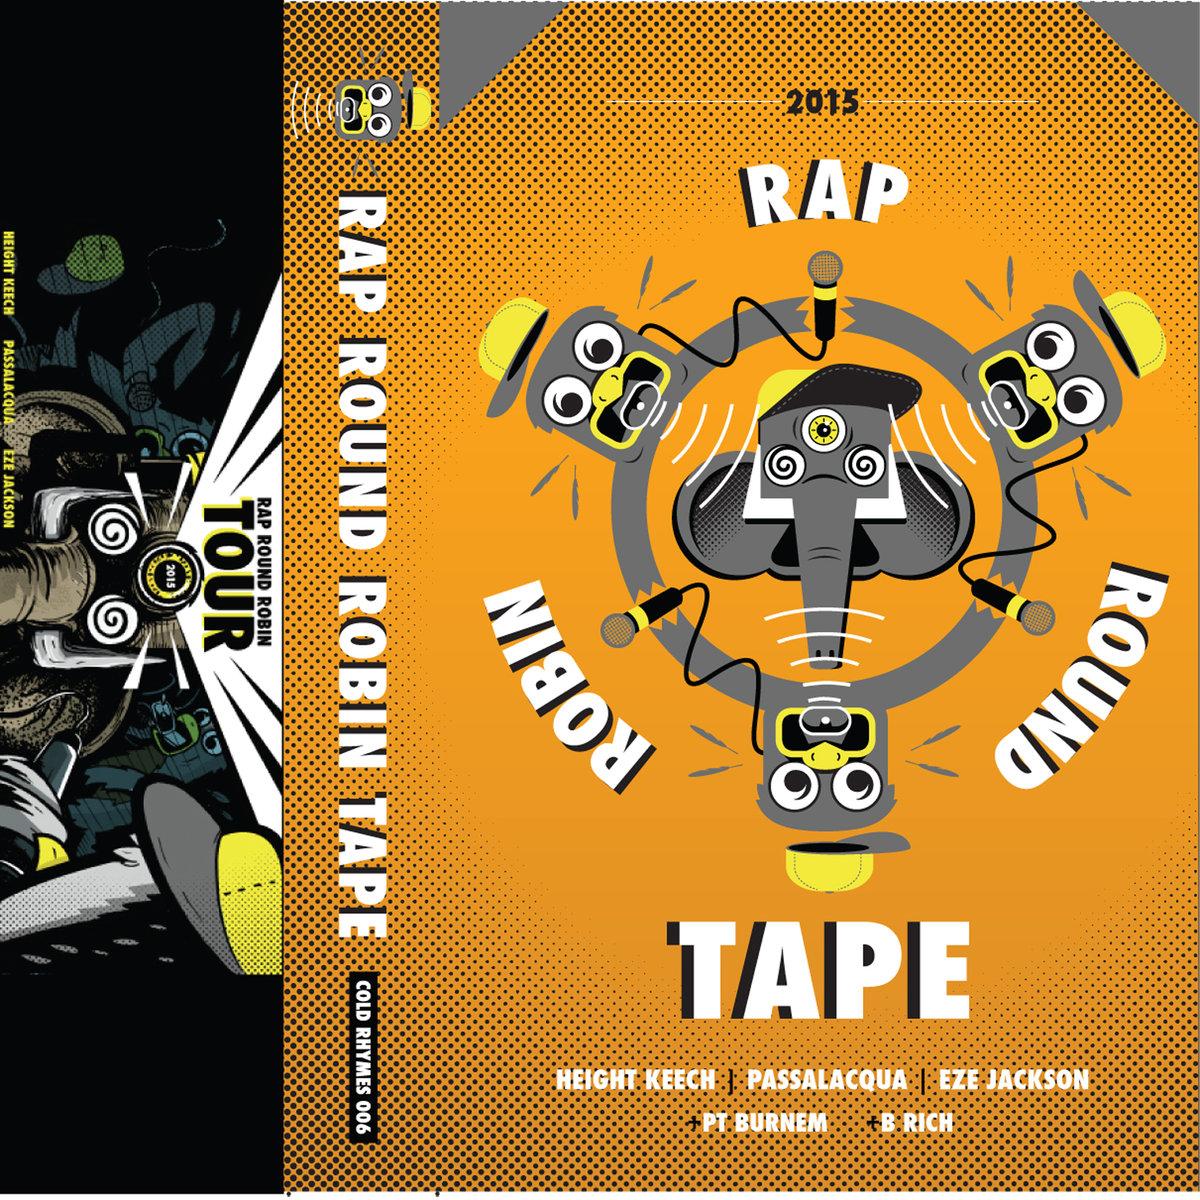 Rap Round Robin Tour Tape (2015)